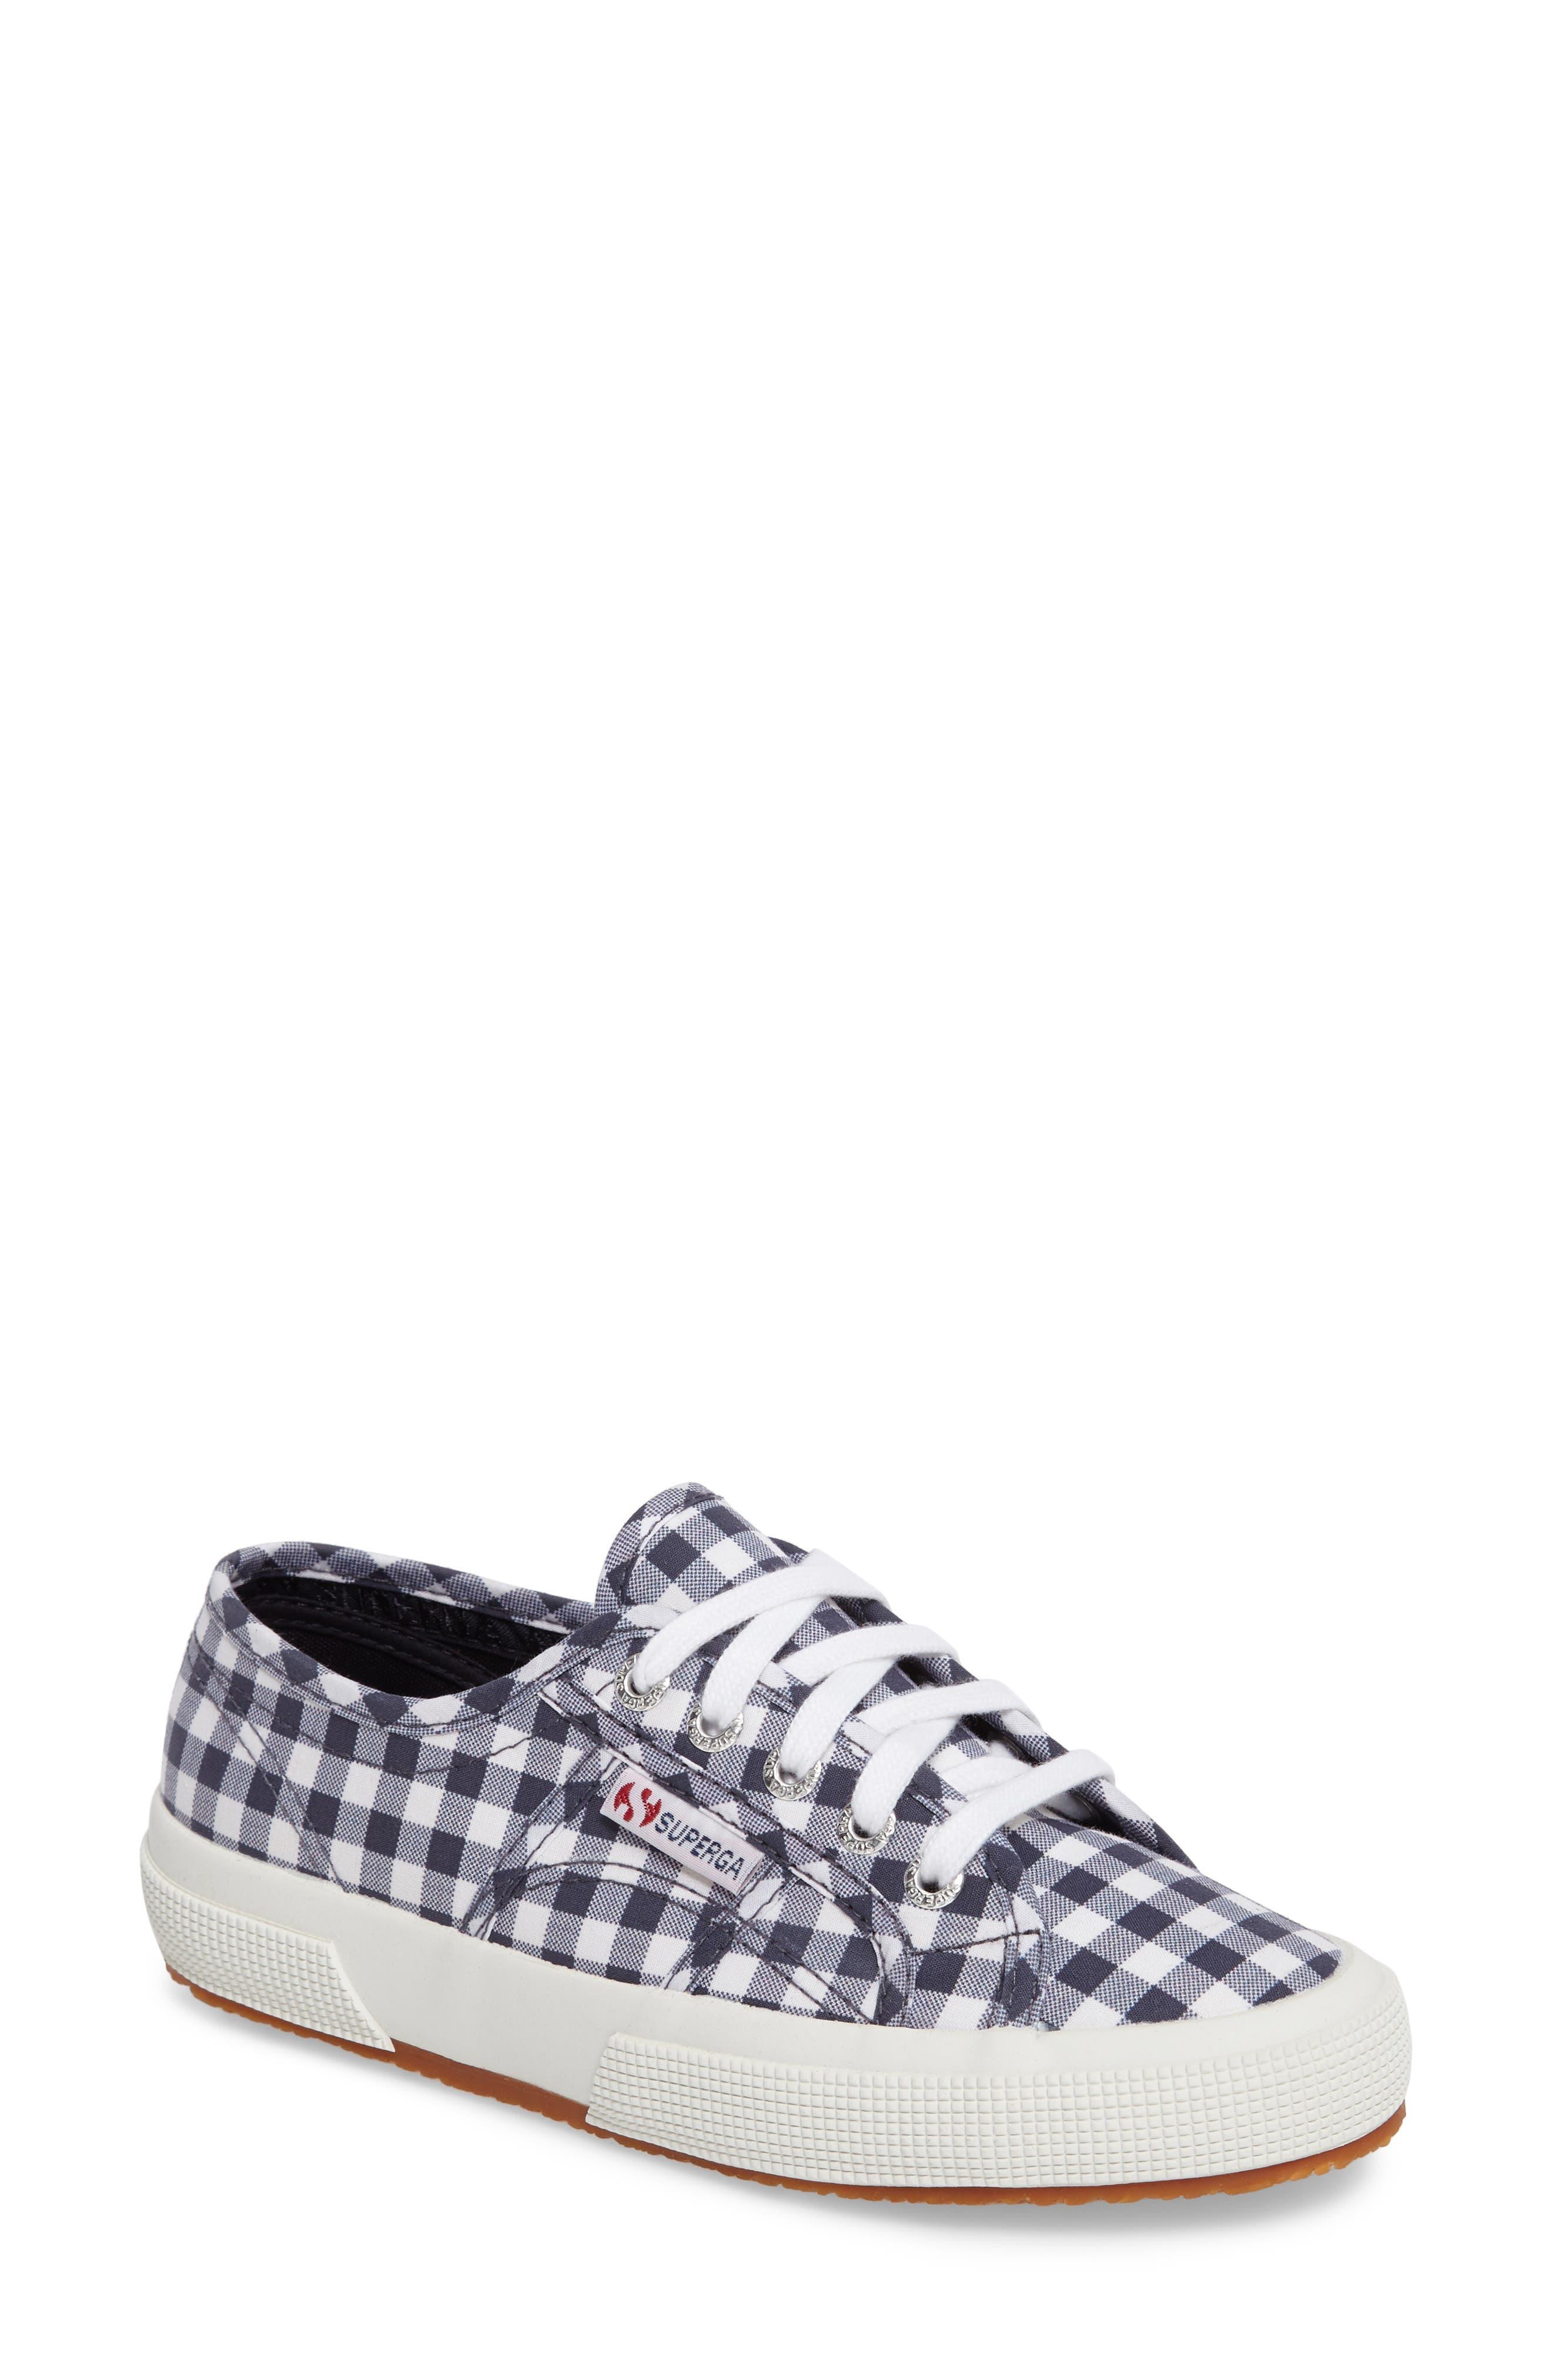 Superga 2750 Calico Sneaker (Women)